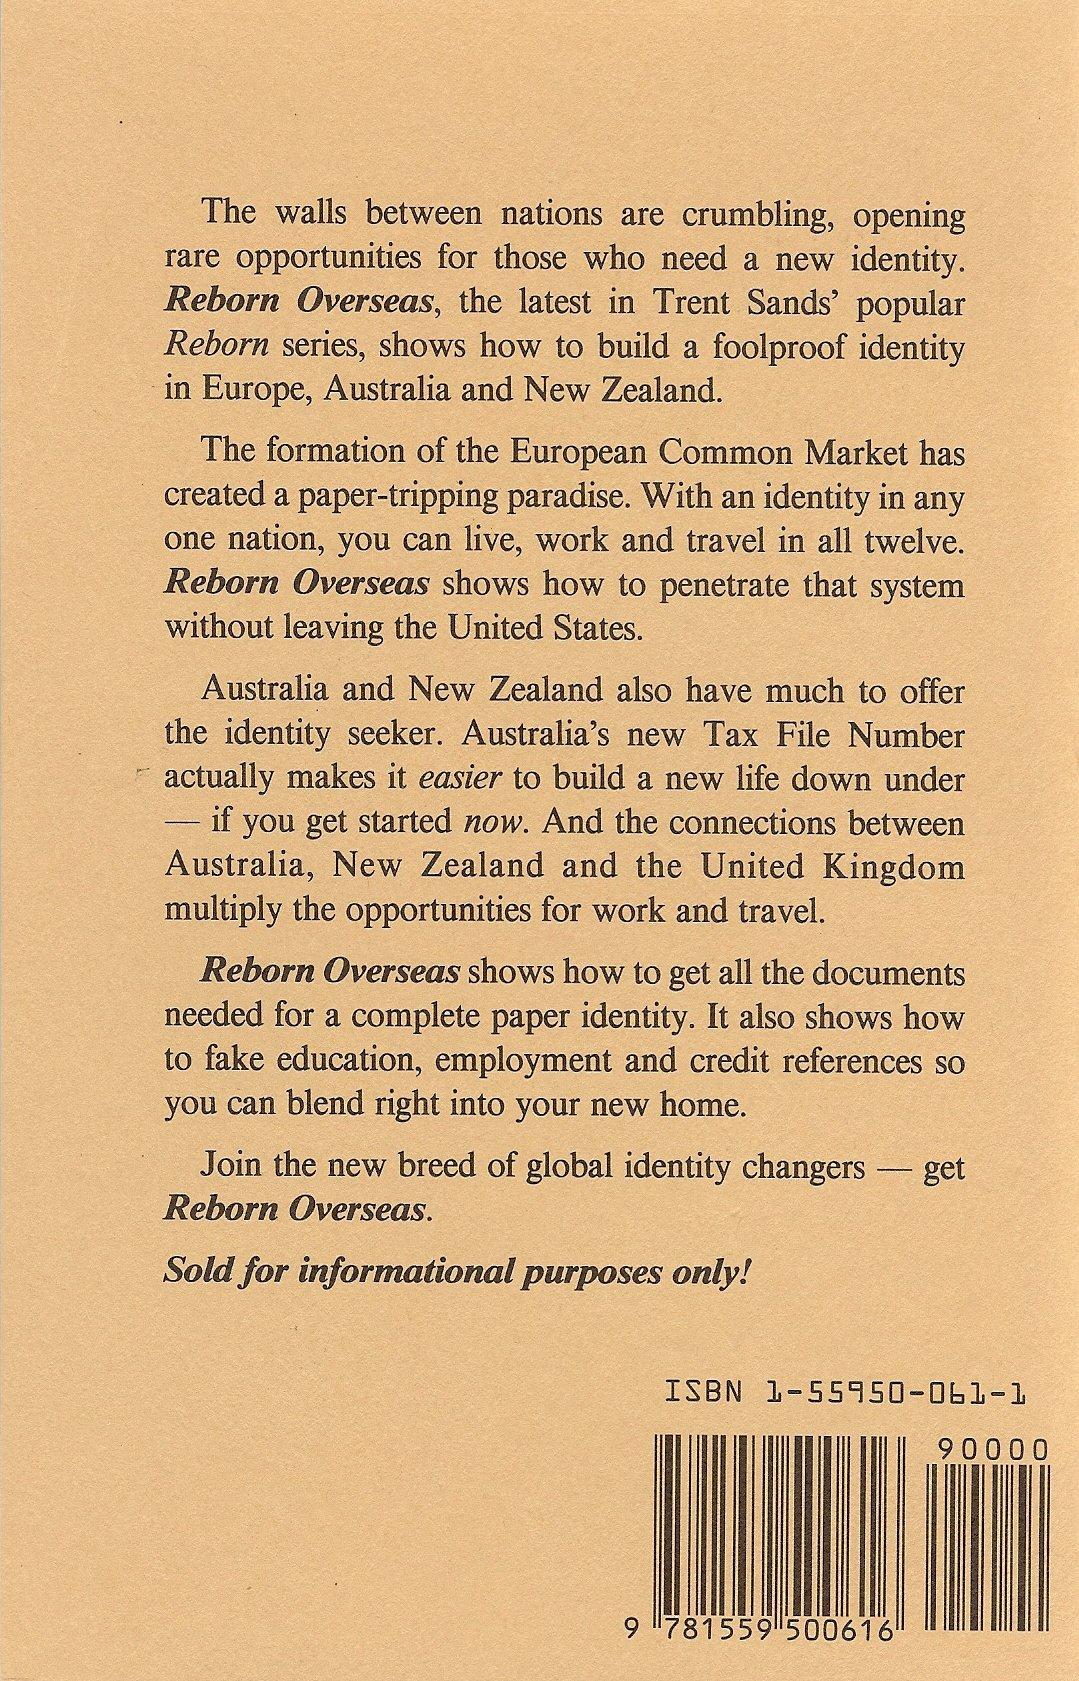 Reborn Overseas  Identity Building In Europe, Australia And New Zealand:  Trent Sands: 9781559500616: Amazon: Books